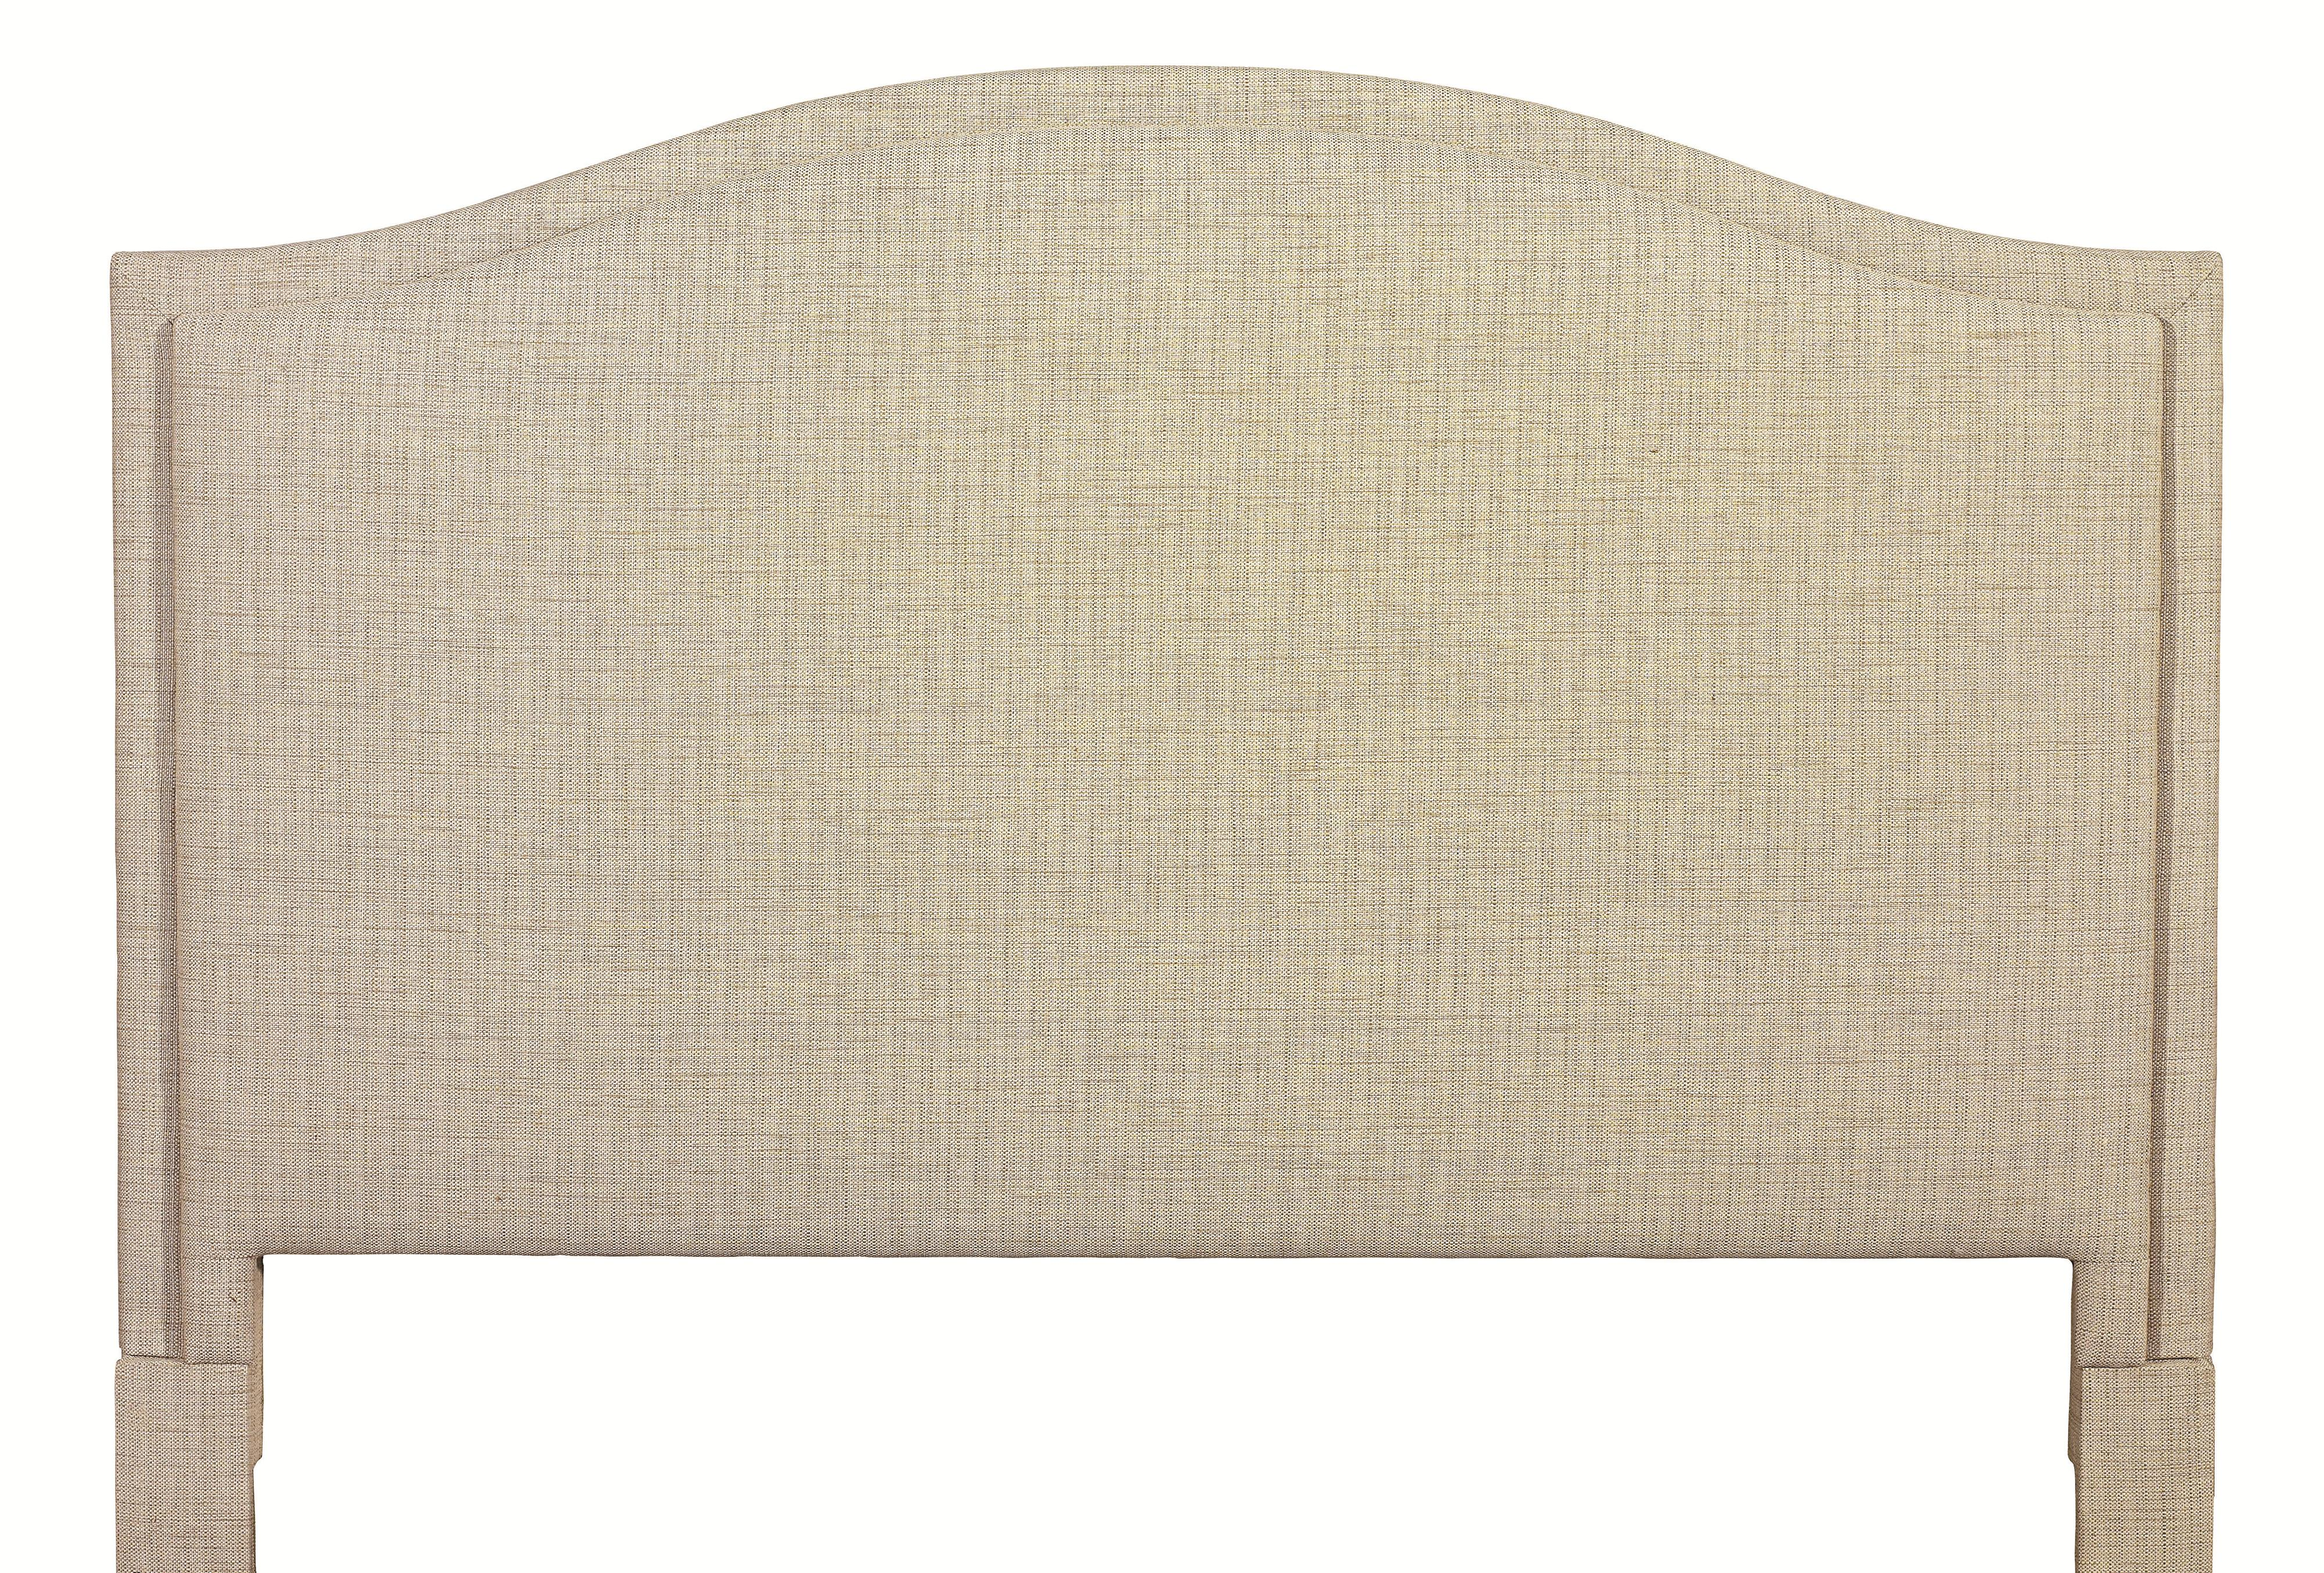 King Vienna Upholstered Headboard